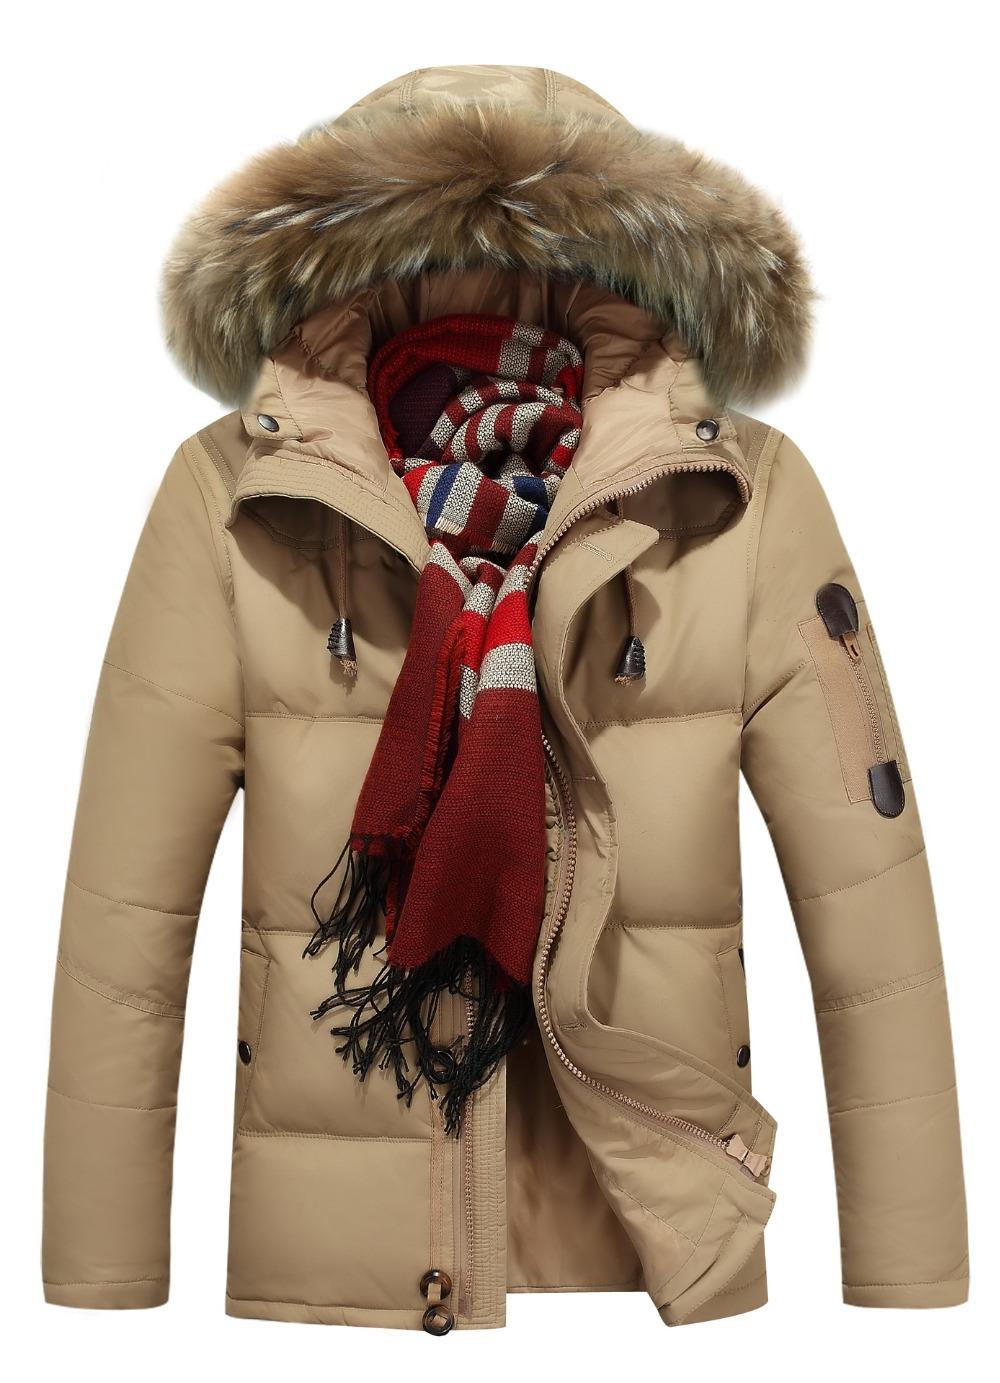 2015 Hot Sale Men Down Jacket Coat Winter Jacket Warm Padded Fur Collar Parka Sportswear Winter Jacket Men M39(China (Mainland))